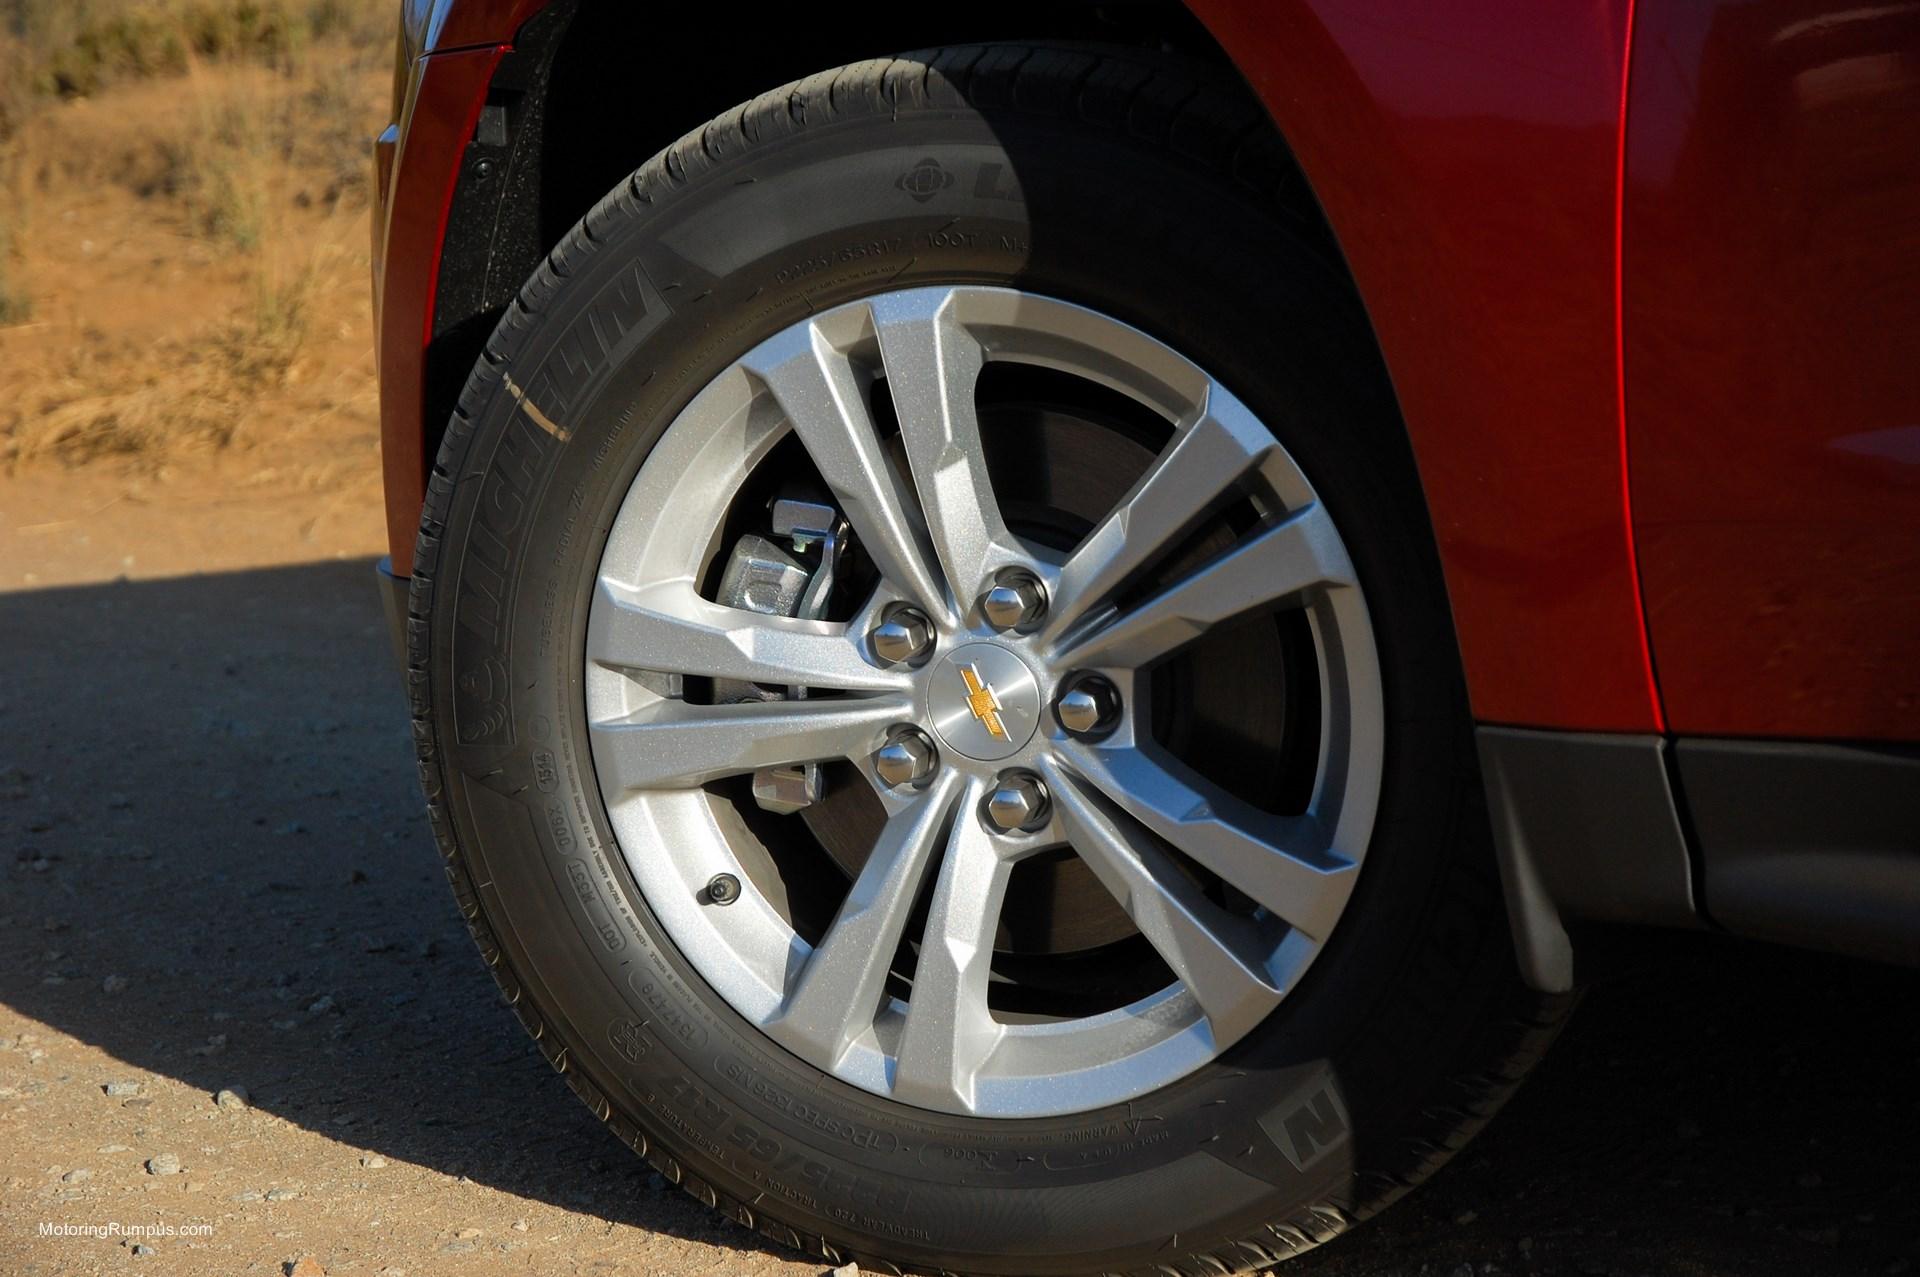 2014 Chevy Equinox 17-inch Wheels